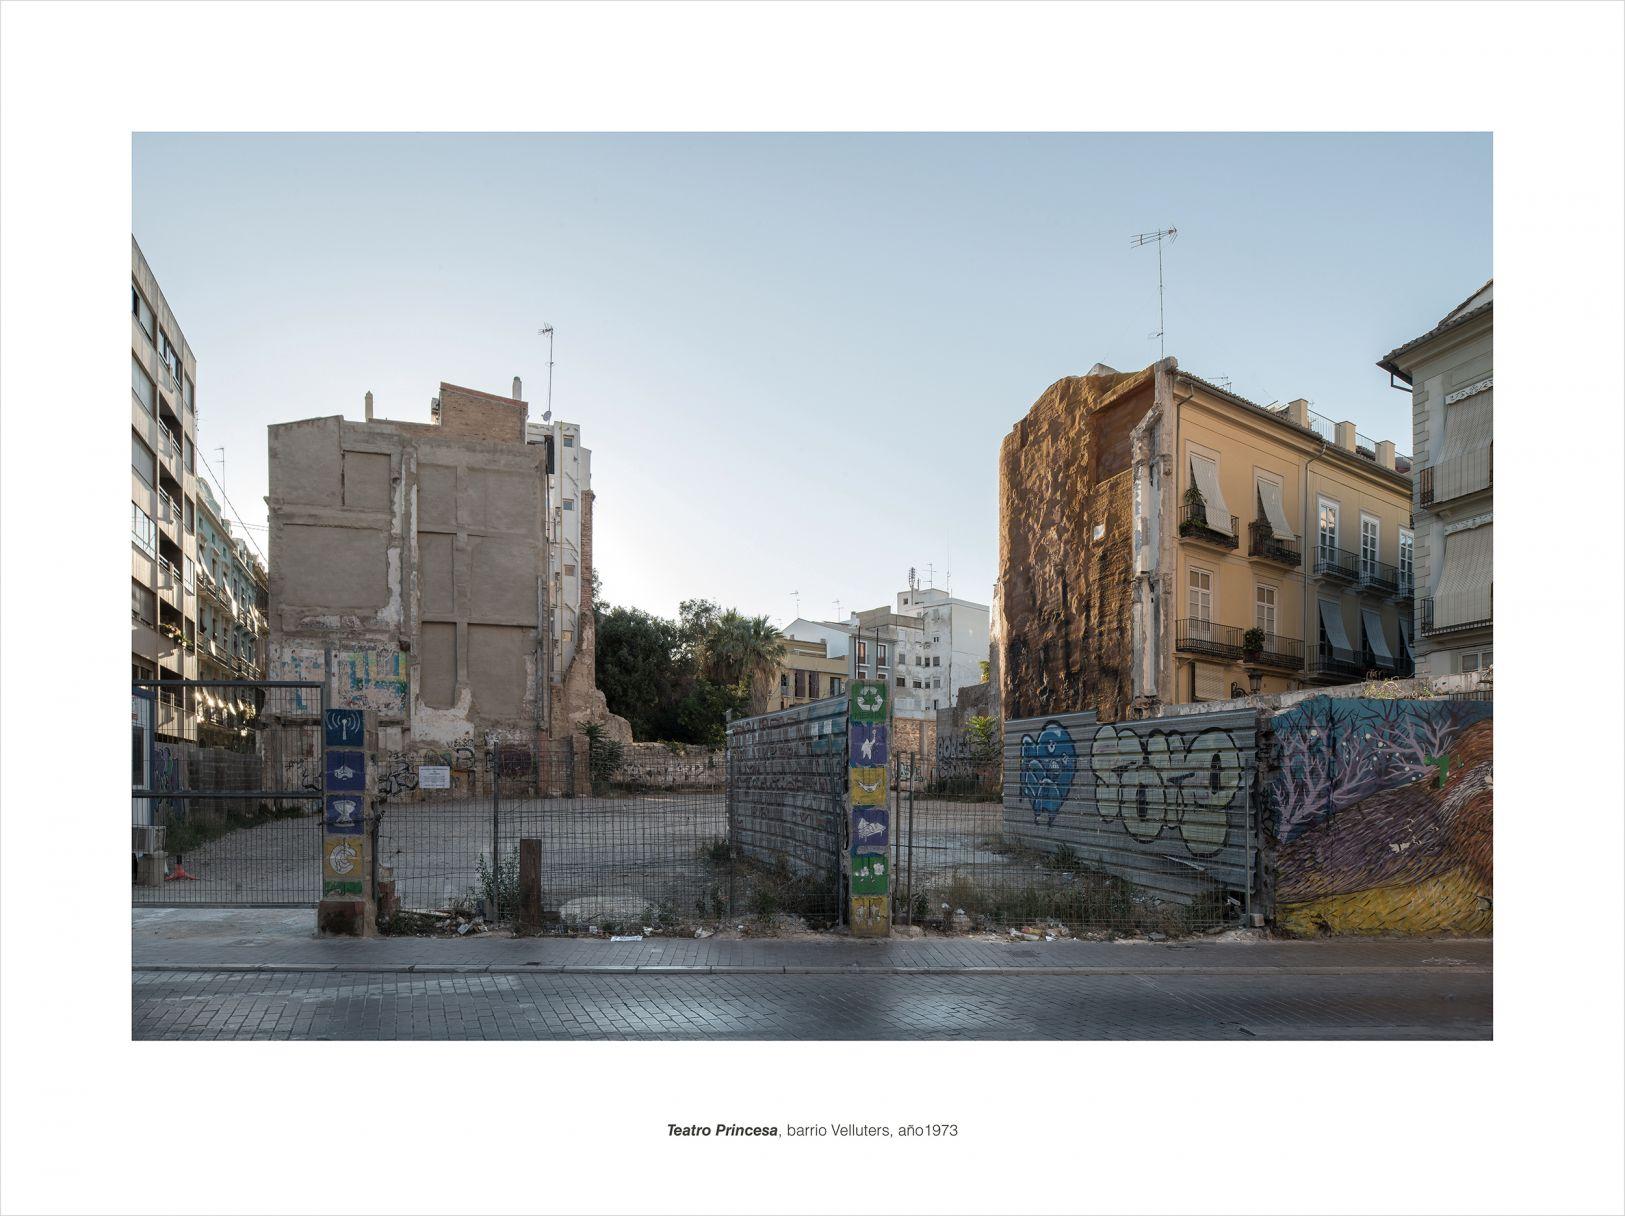 TEATRO PRINCESA, barrio Velluters, año 1973 (2015) - Alfonso Legaz